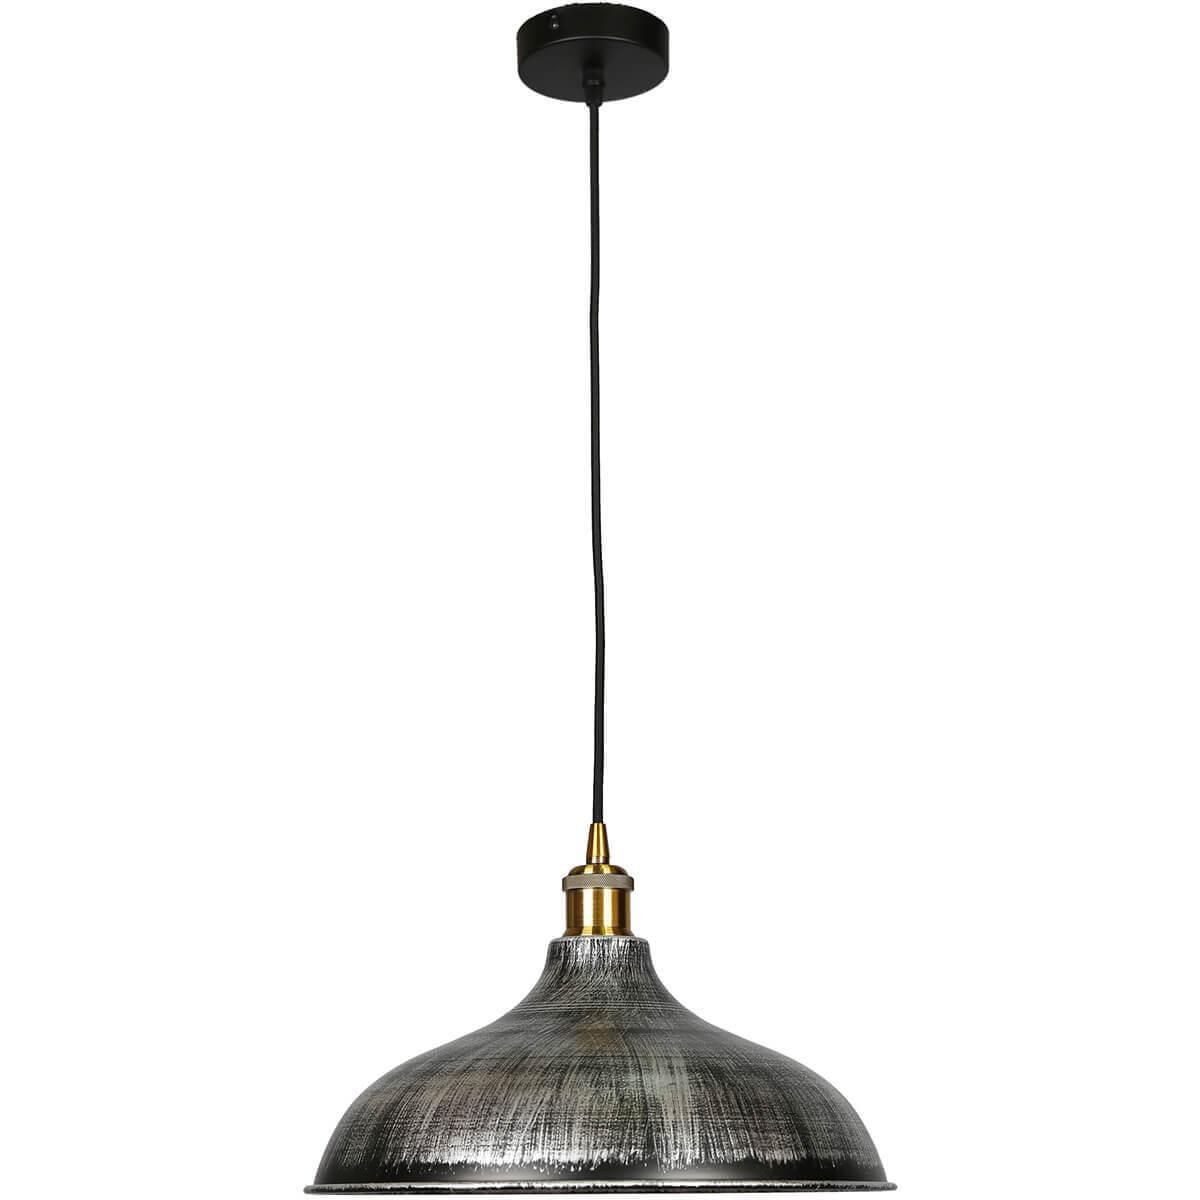 Подвесной светильник Omnilux OML-90206-01, E27, 60 Вт